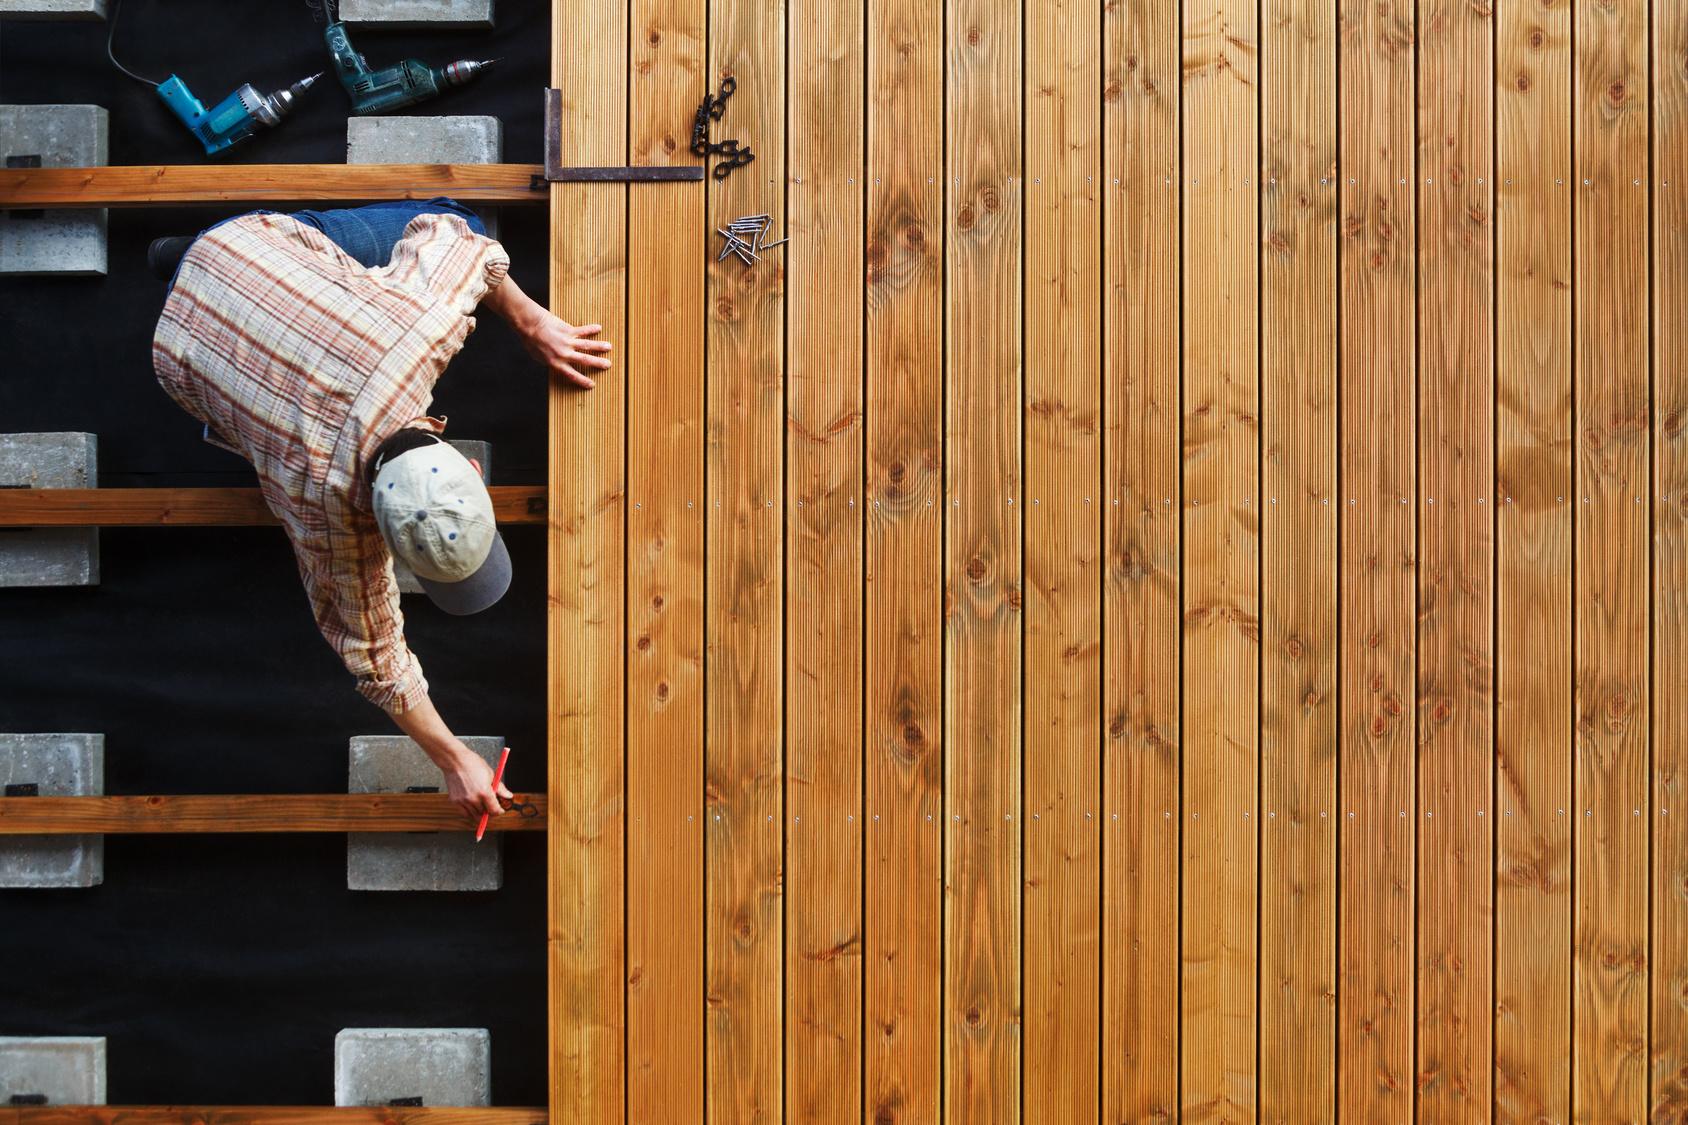 terrassenholz holzarten f r die terrasse theo. Black Bedroom Furniture Sets. Home Design Ideas